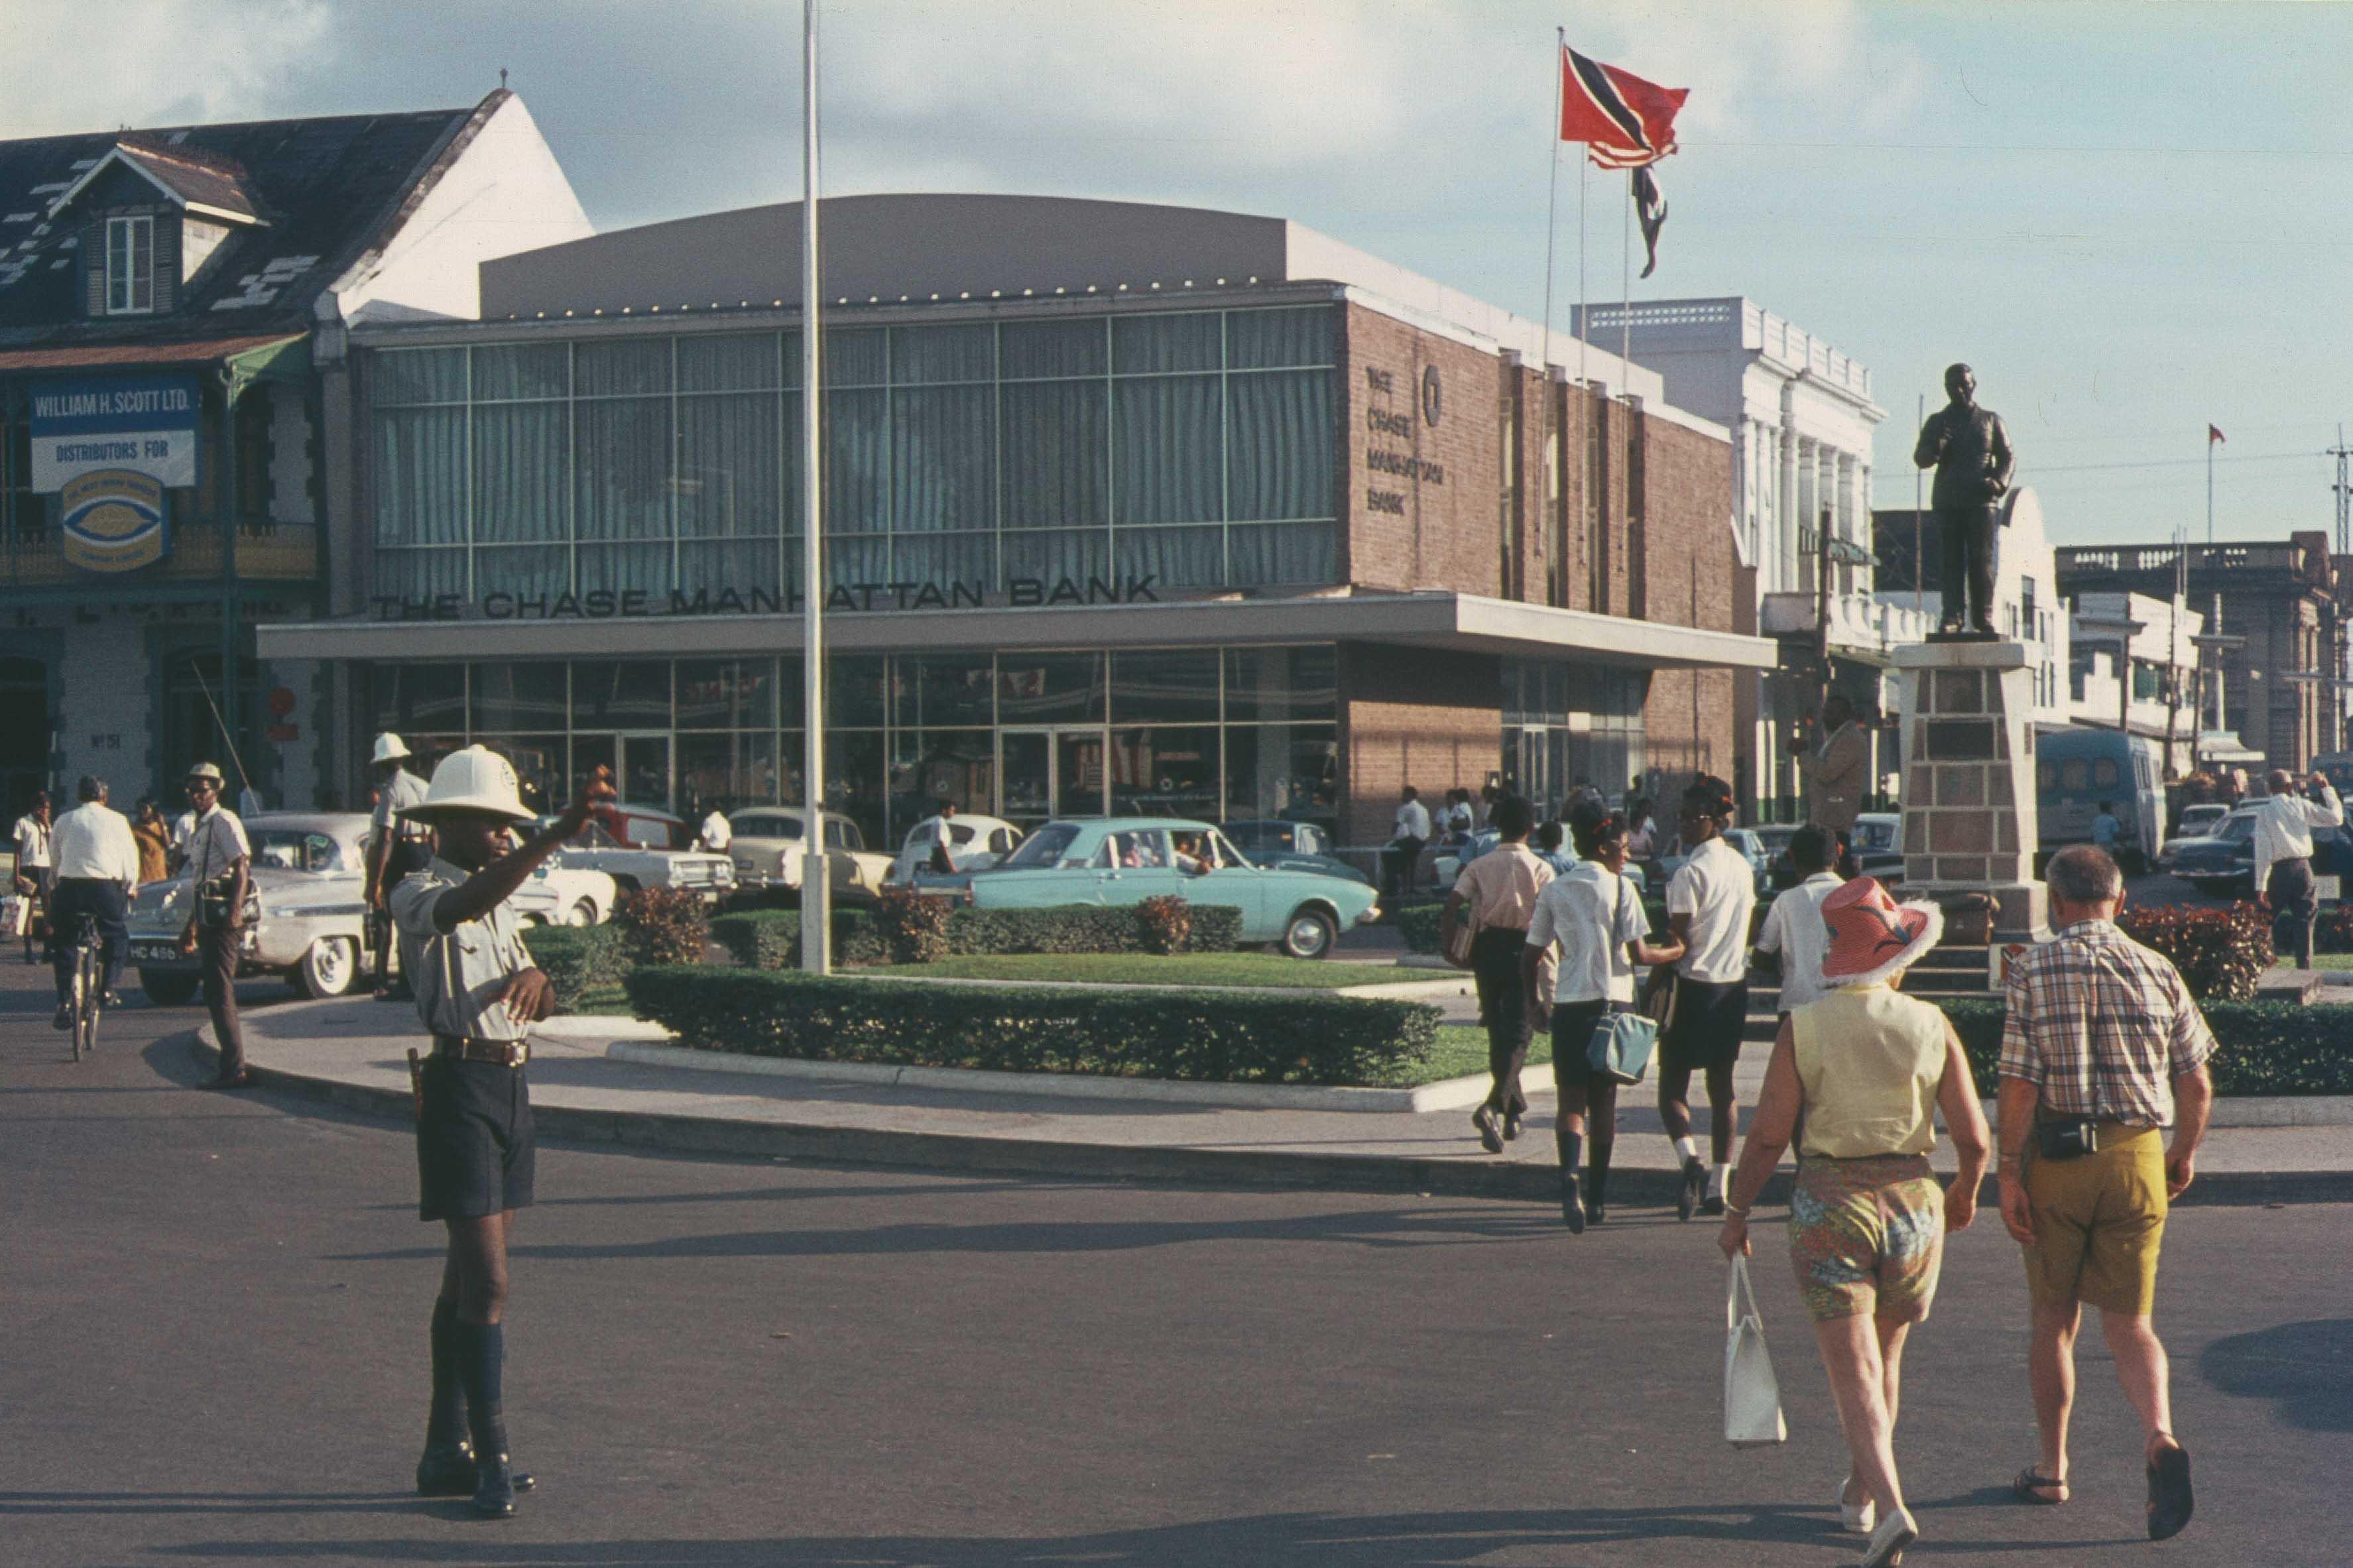 599. Suriname